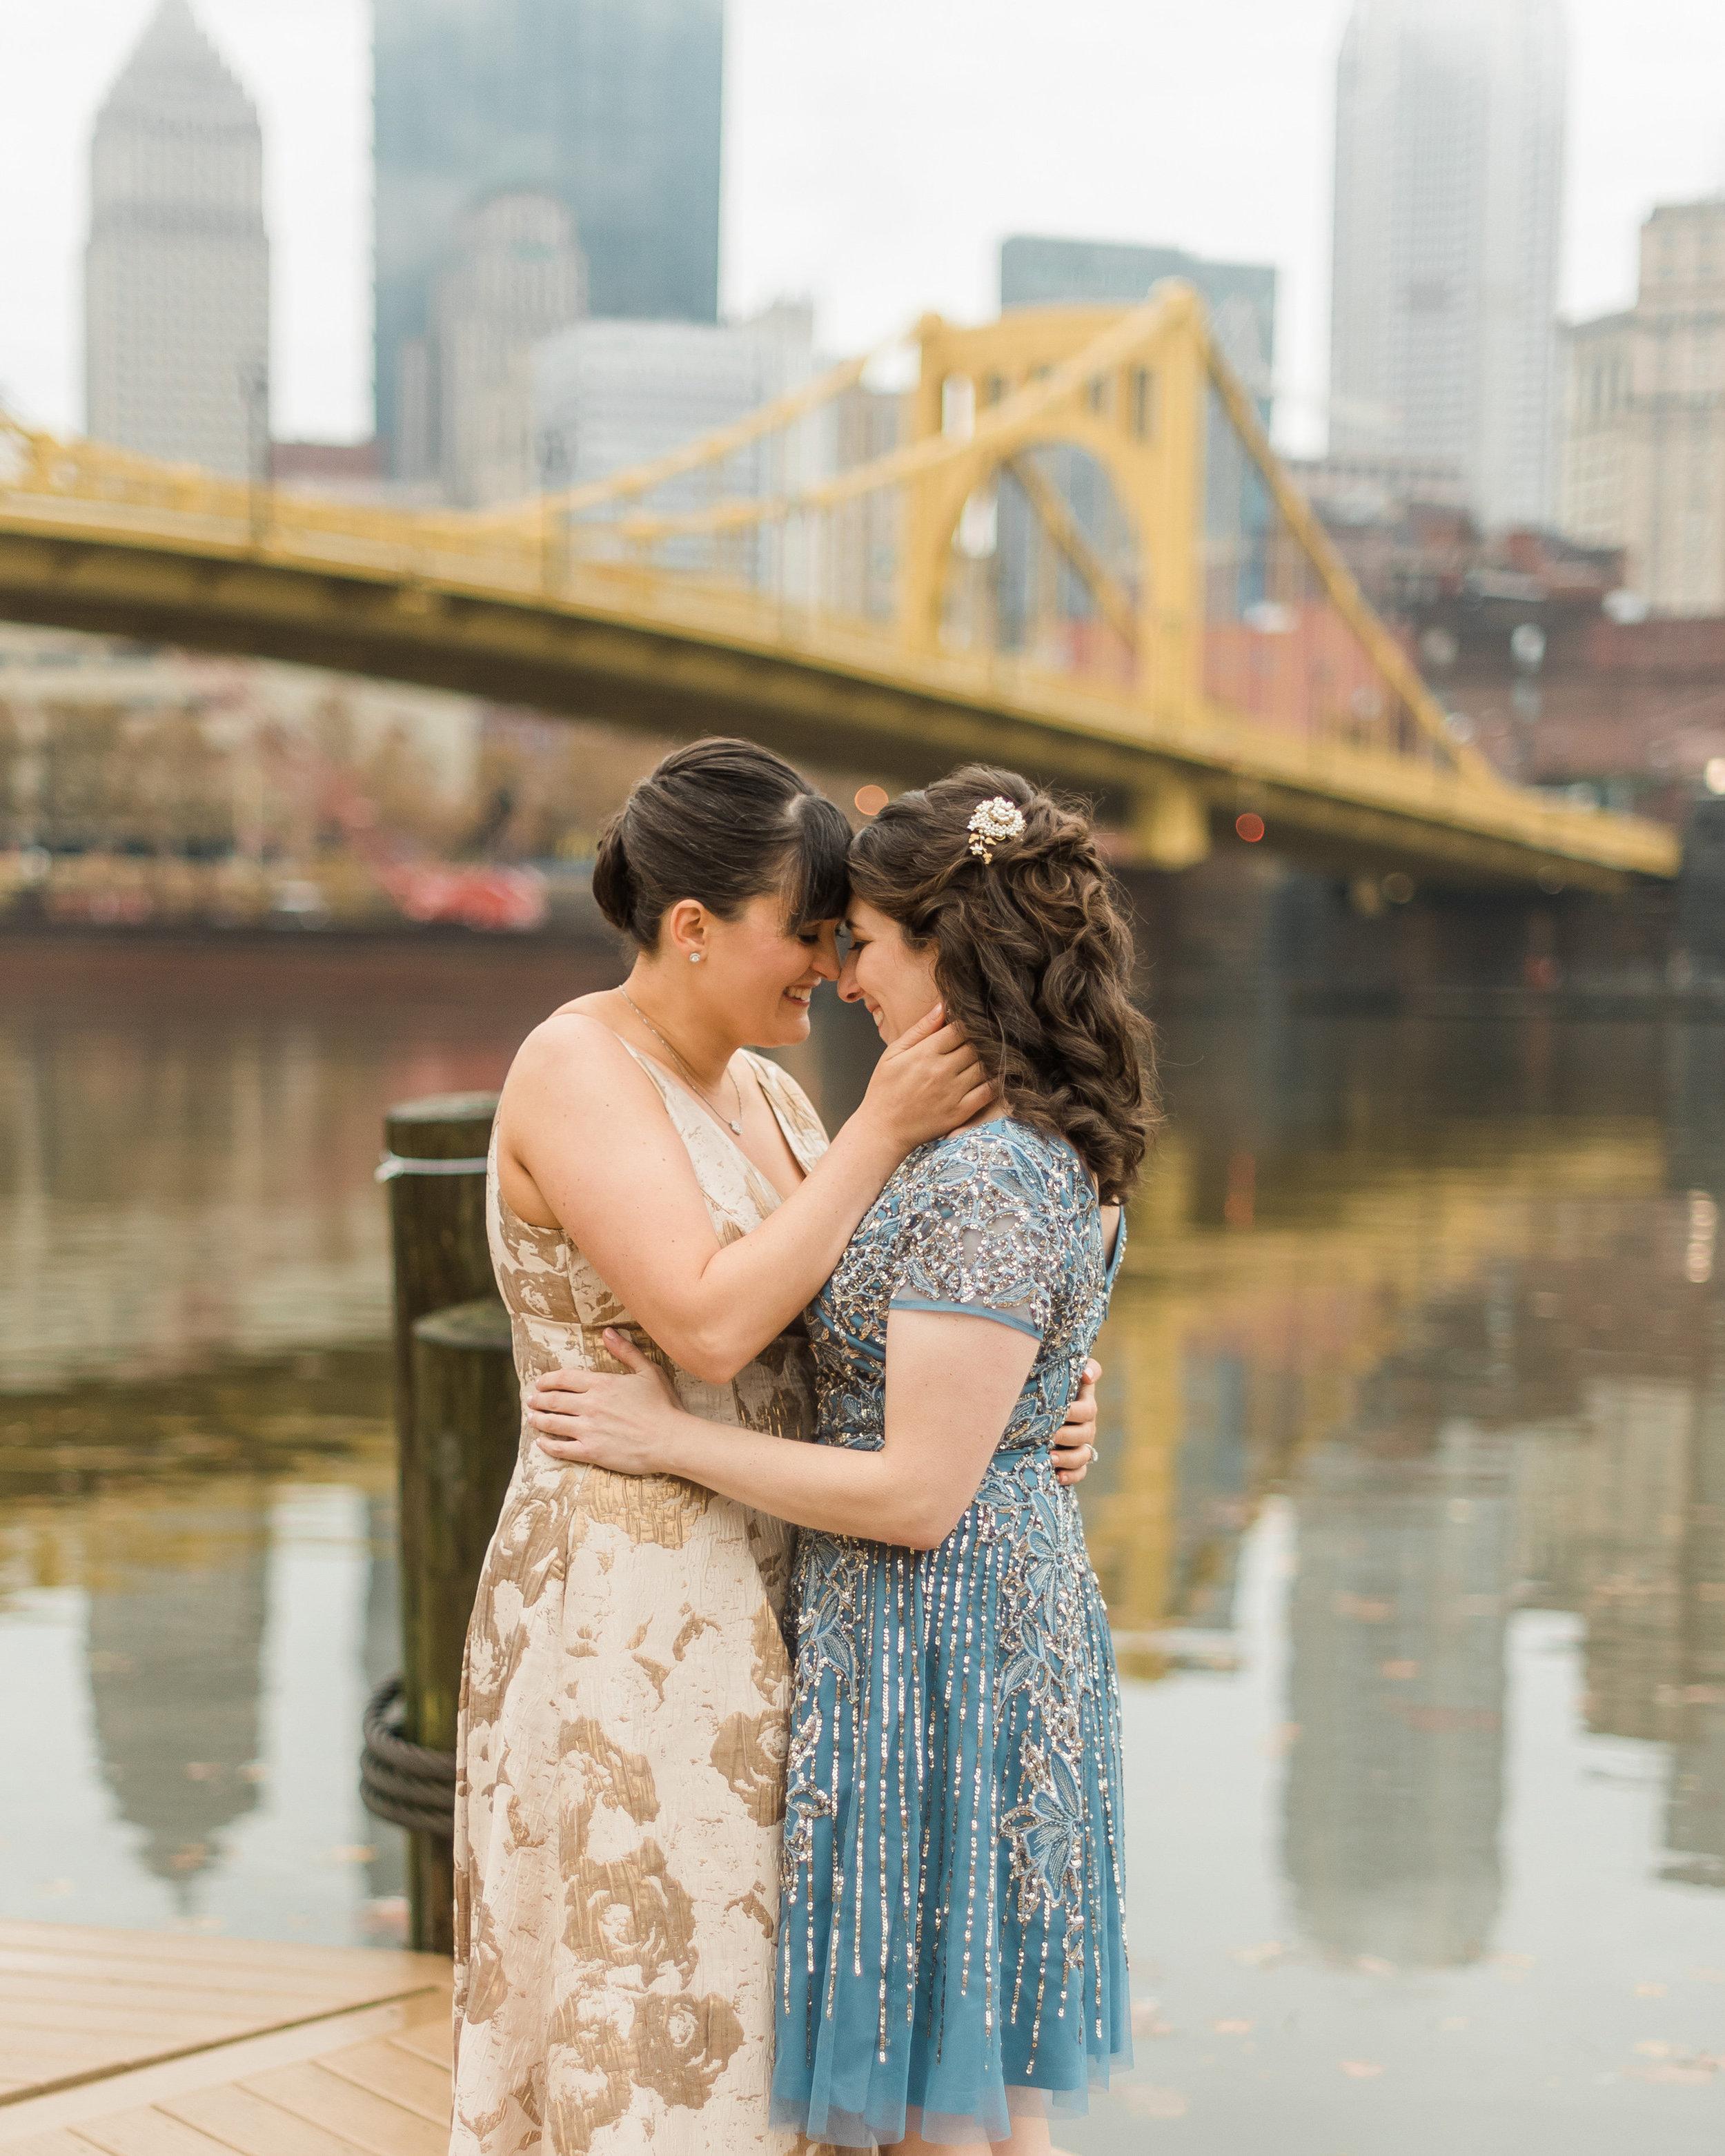 pittsburgh-wedding-photographer-lgbtqfriendly-samesex-city0009.jpg